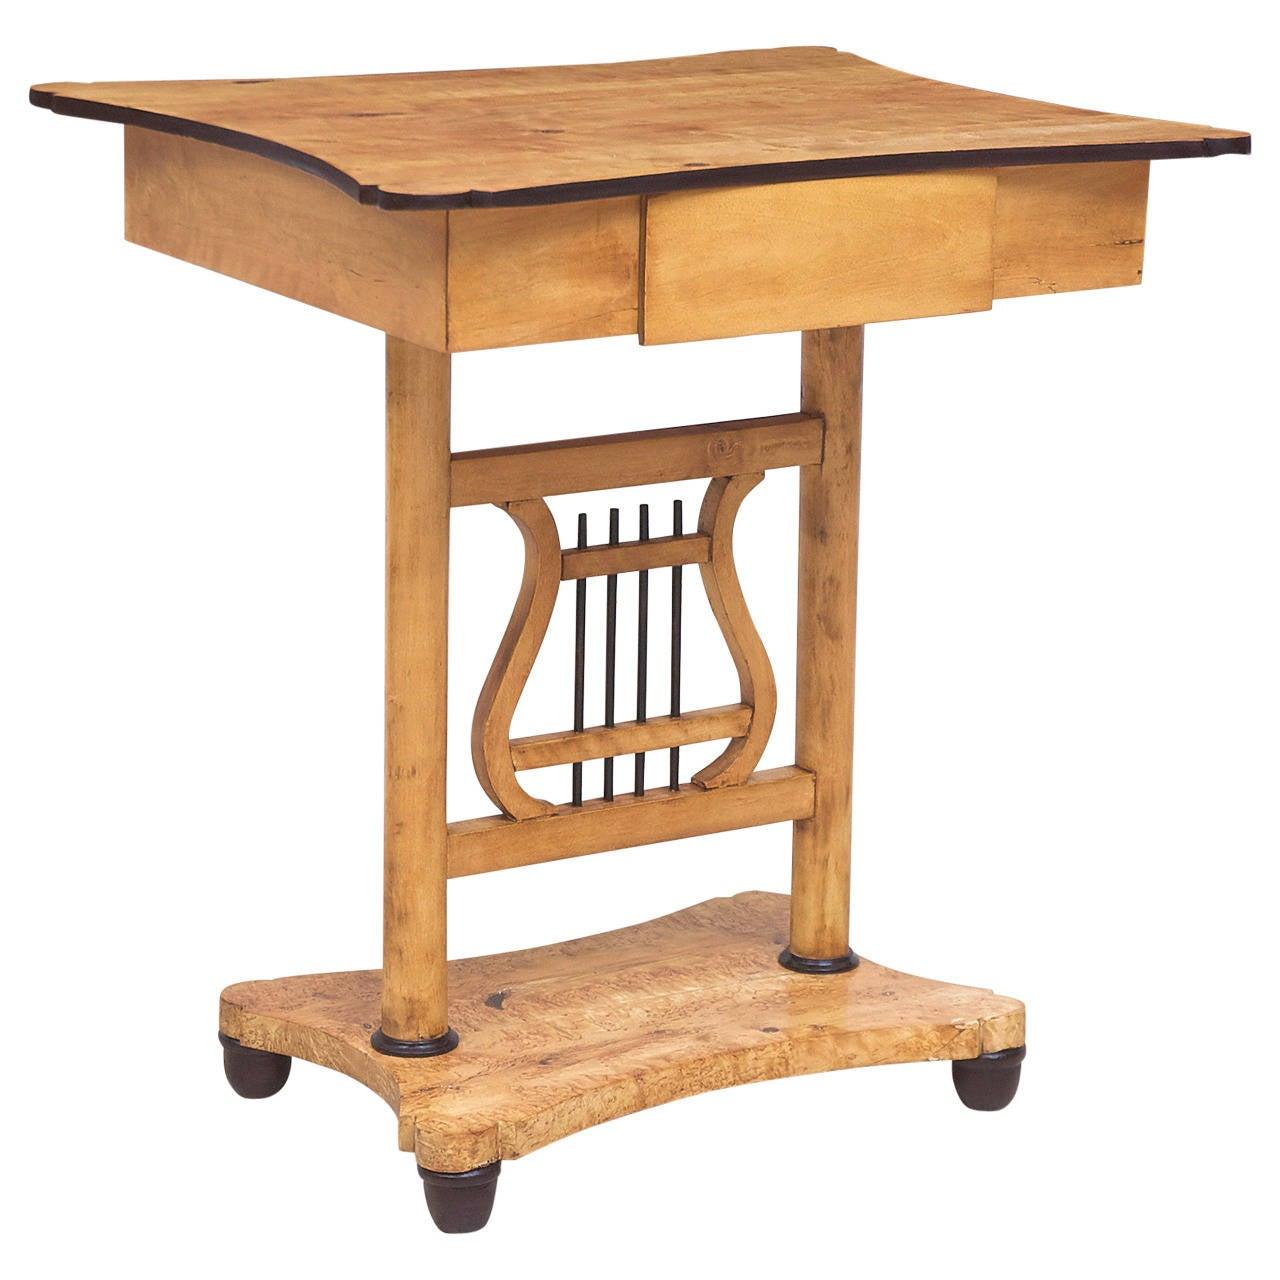 Scandinavian Biedermeier Birch Table with Lyre Pedestal and One Drawer, c. 1820